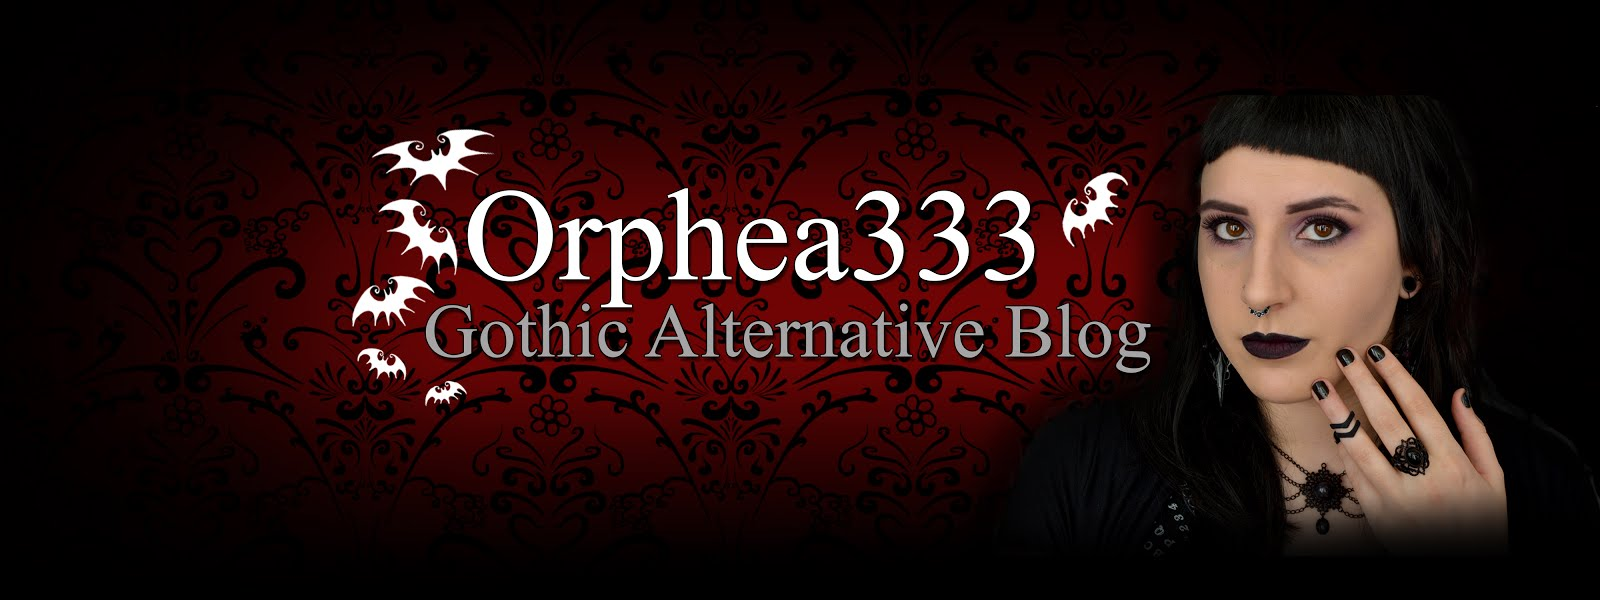 Orphea333